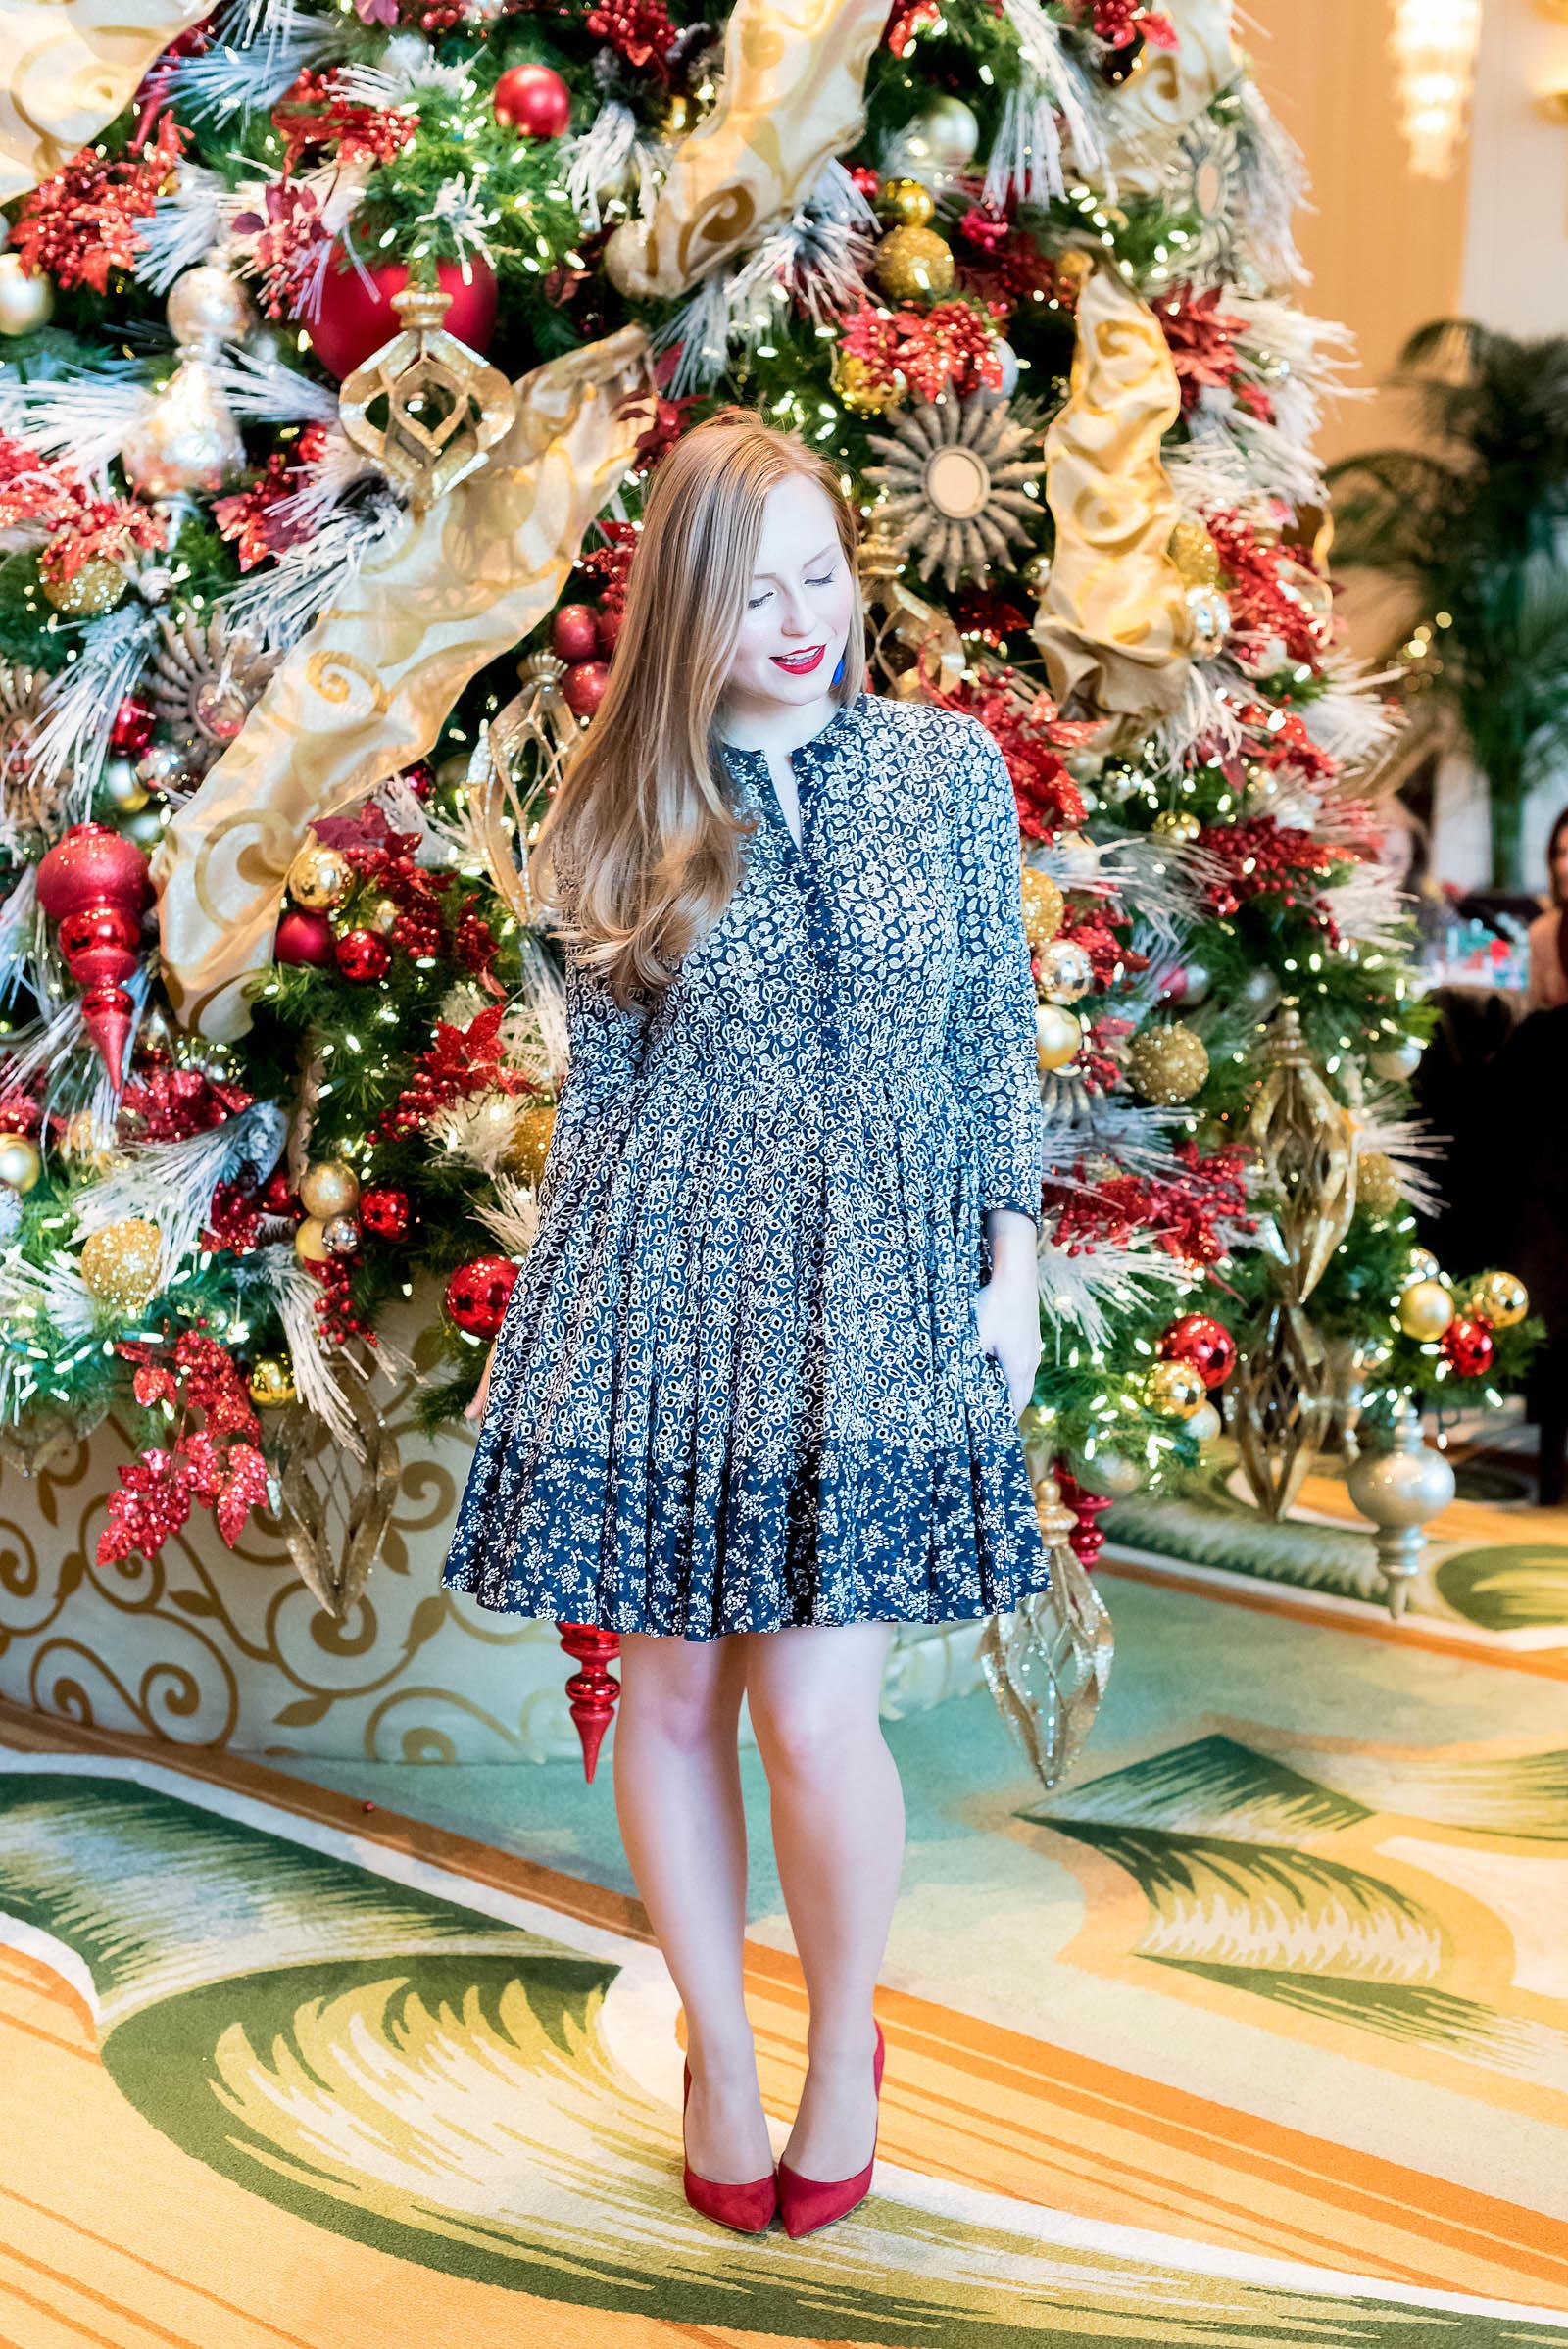 Peninsula Hotel Chicago Christmas Tree